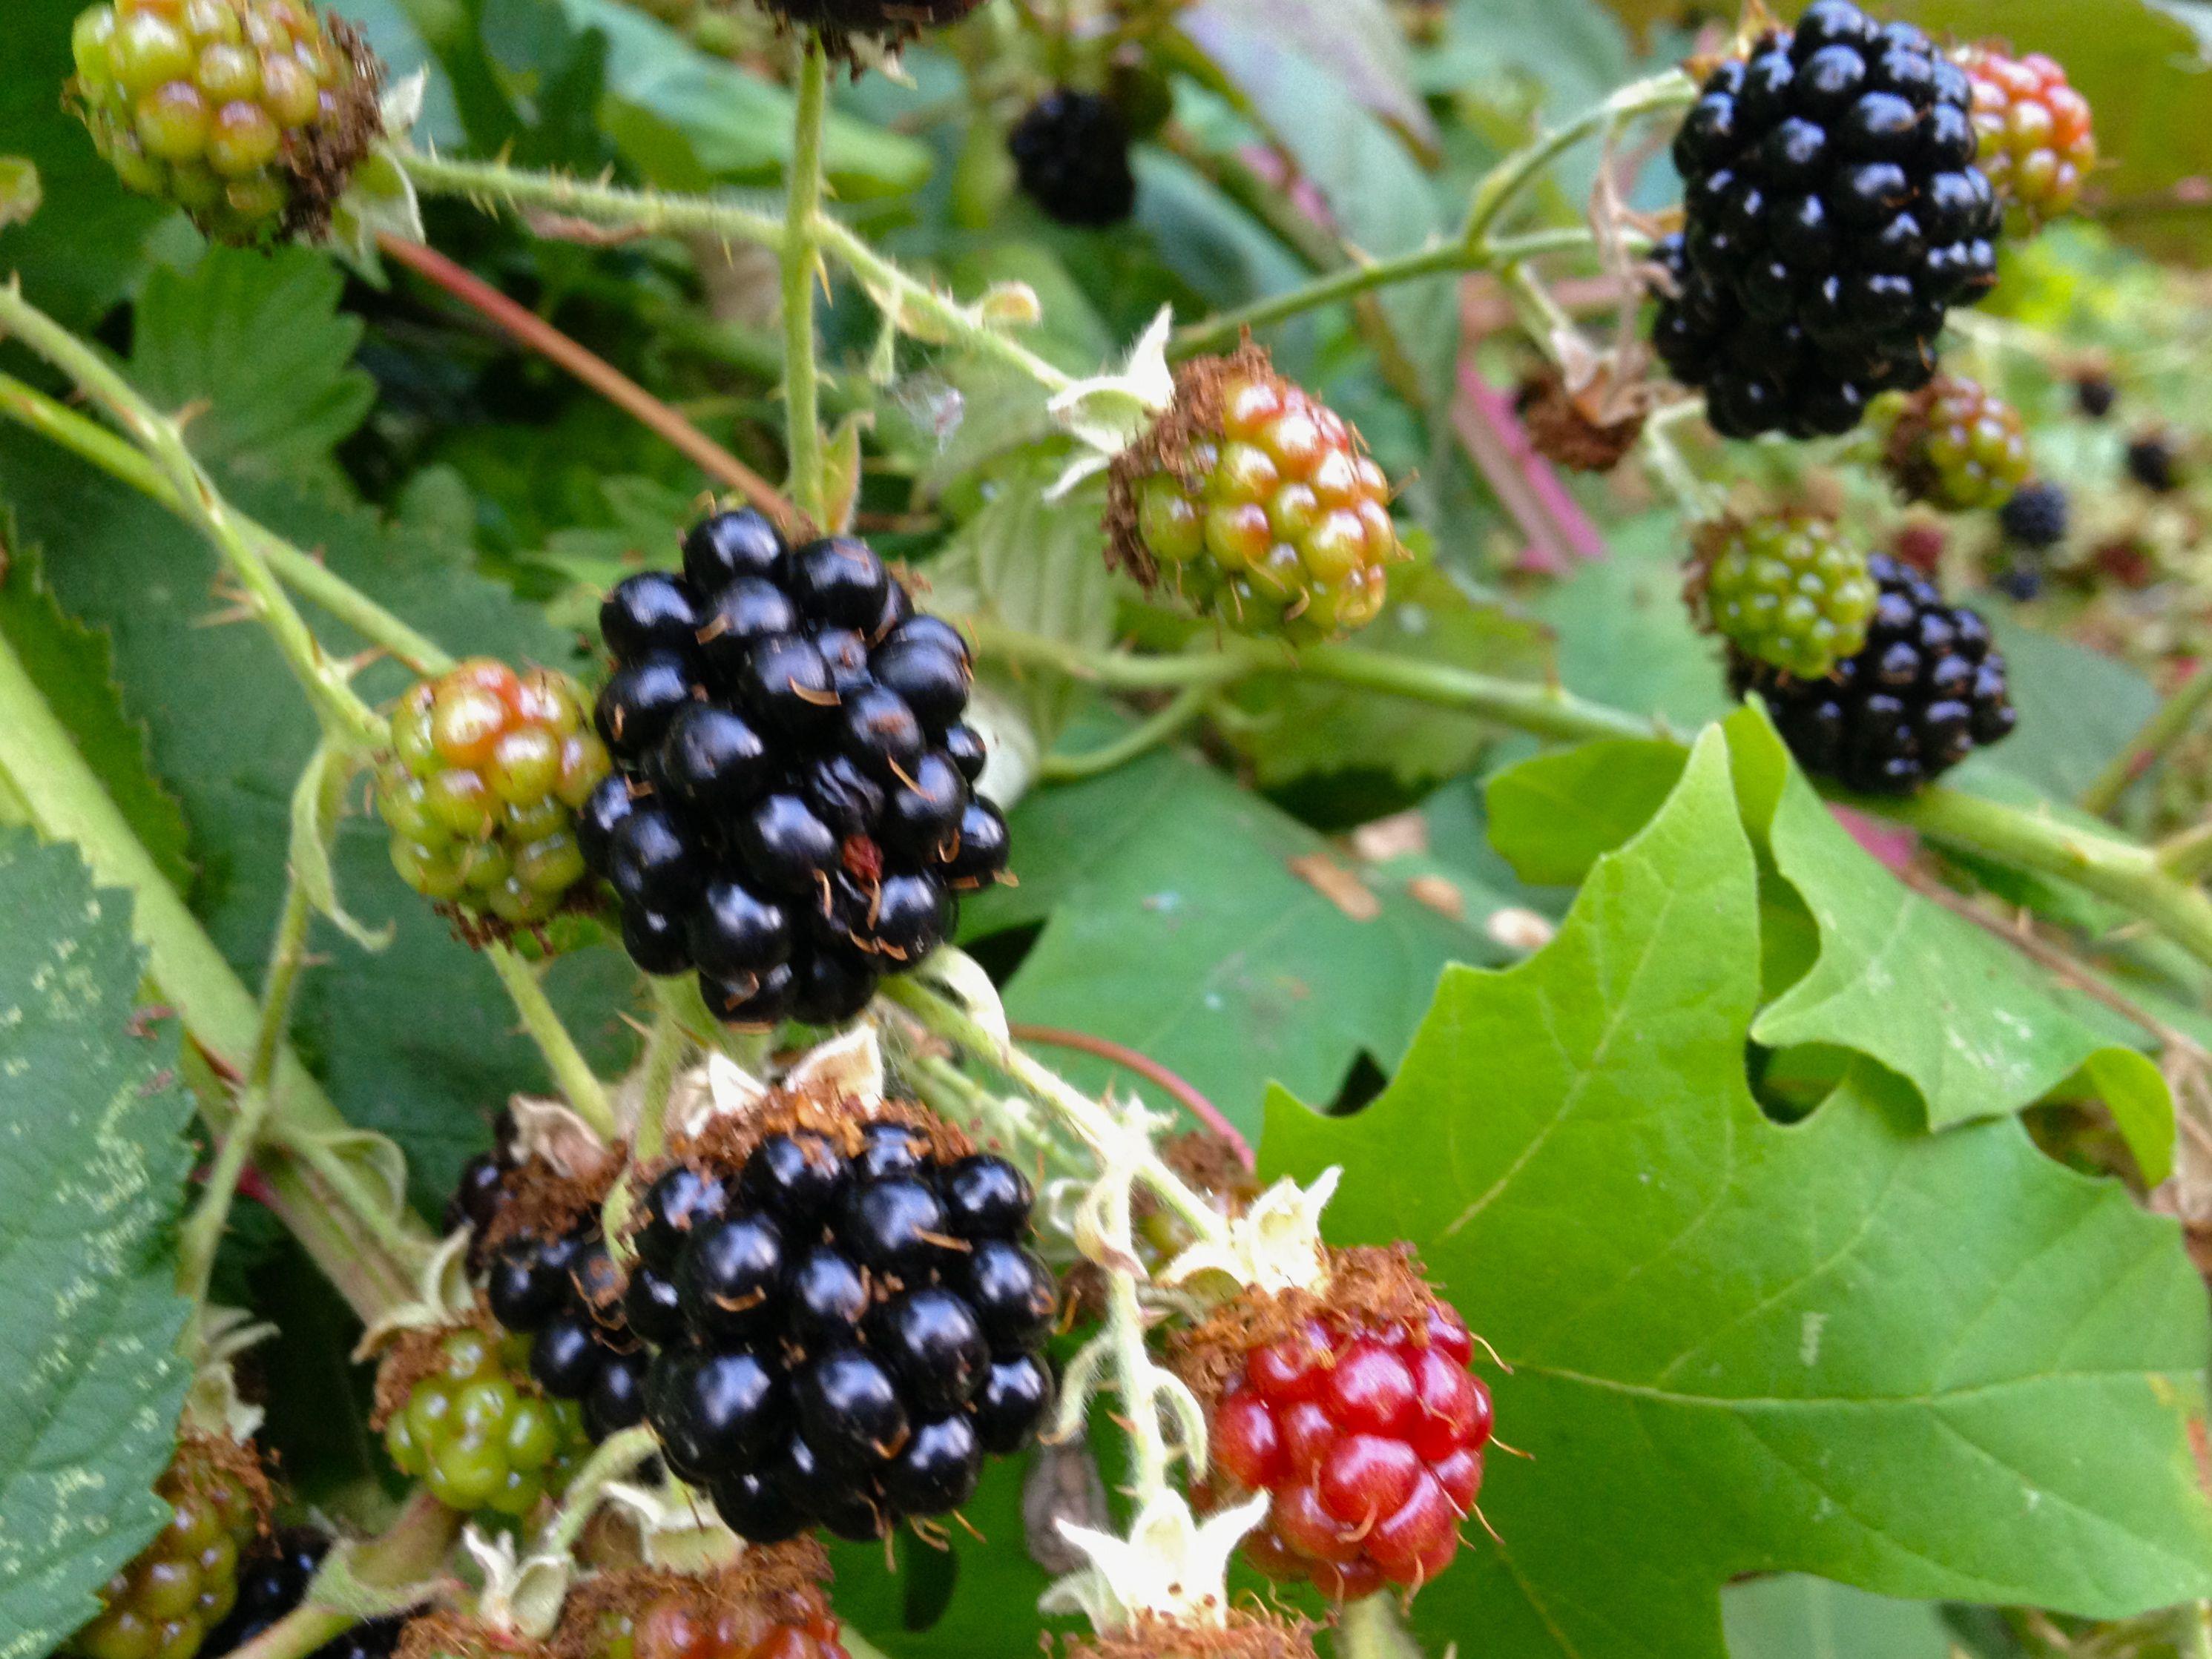 Blackberry habanero jelly habanero jelly jelly blackberry